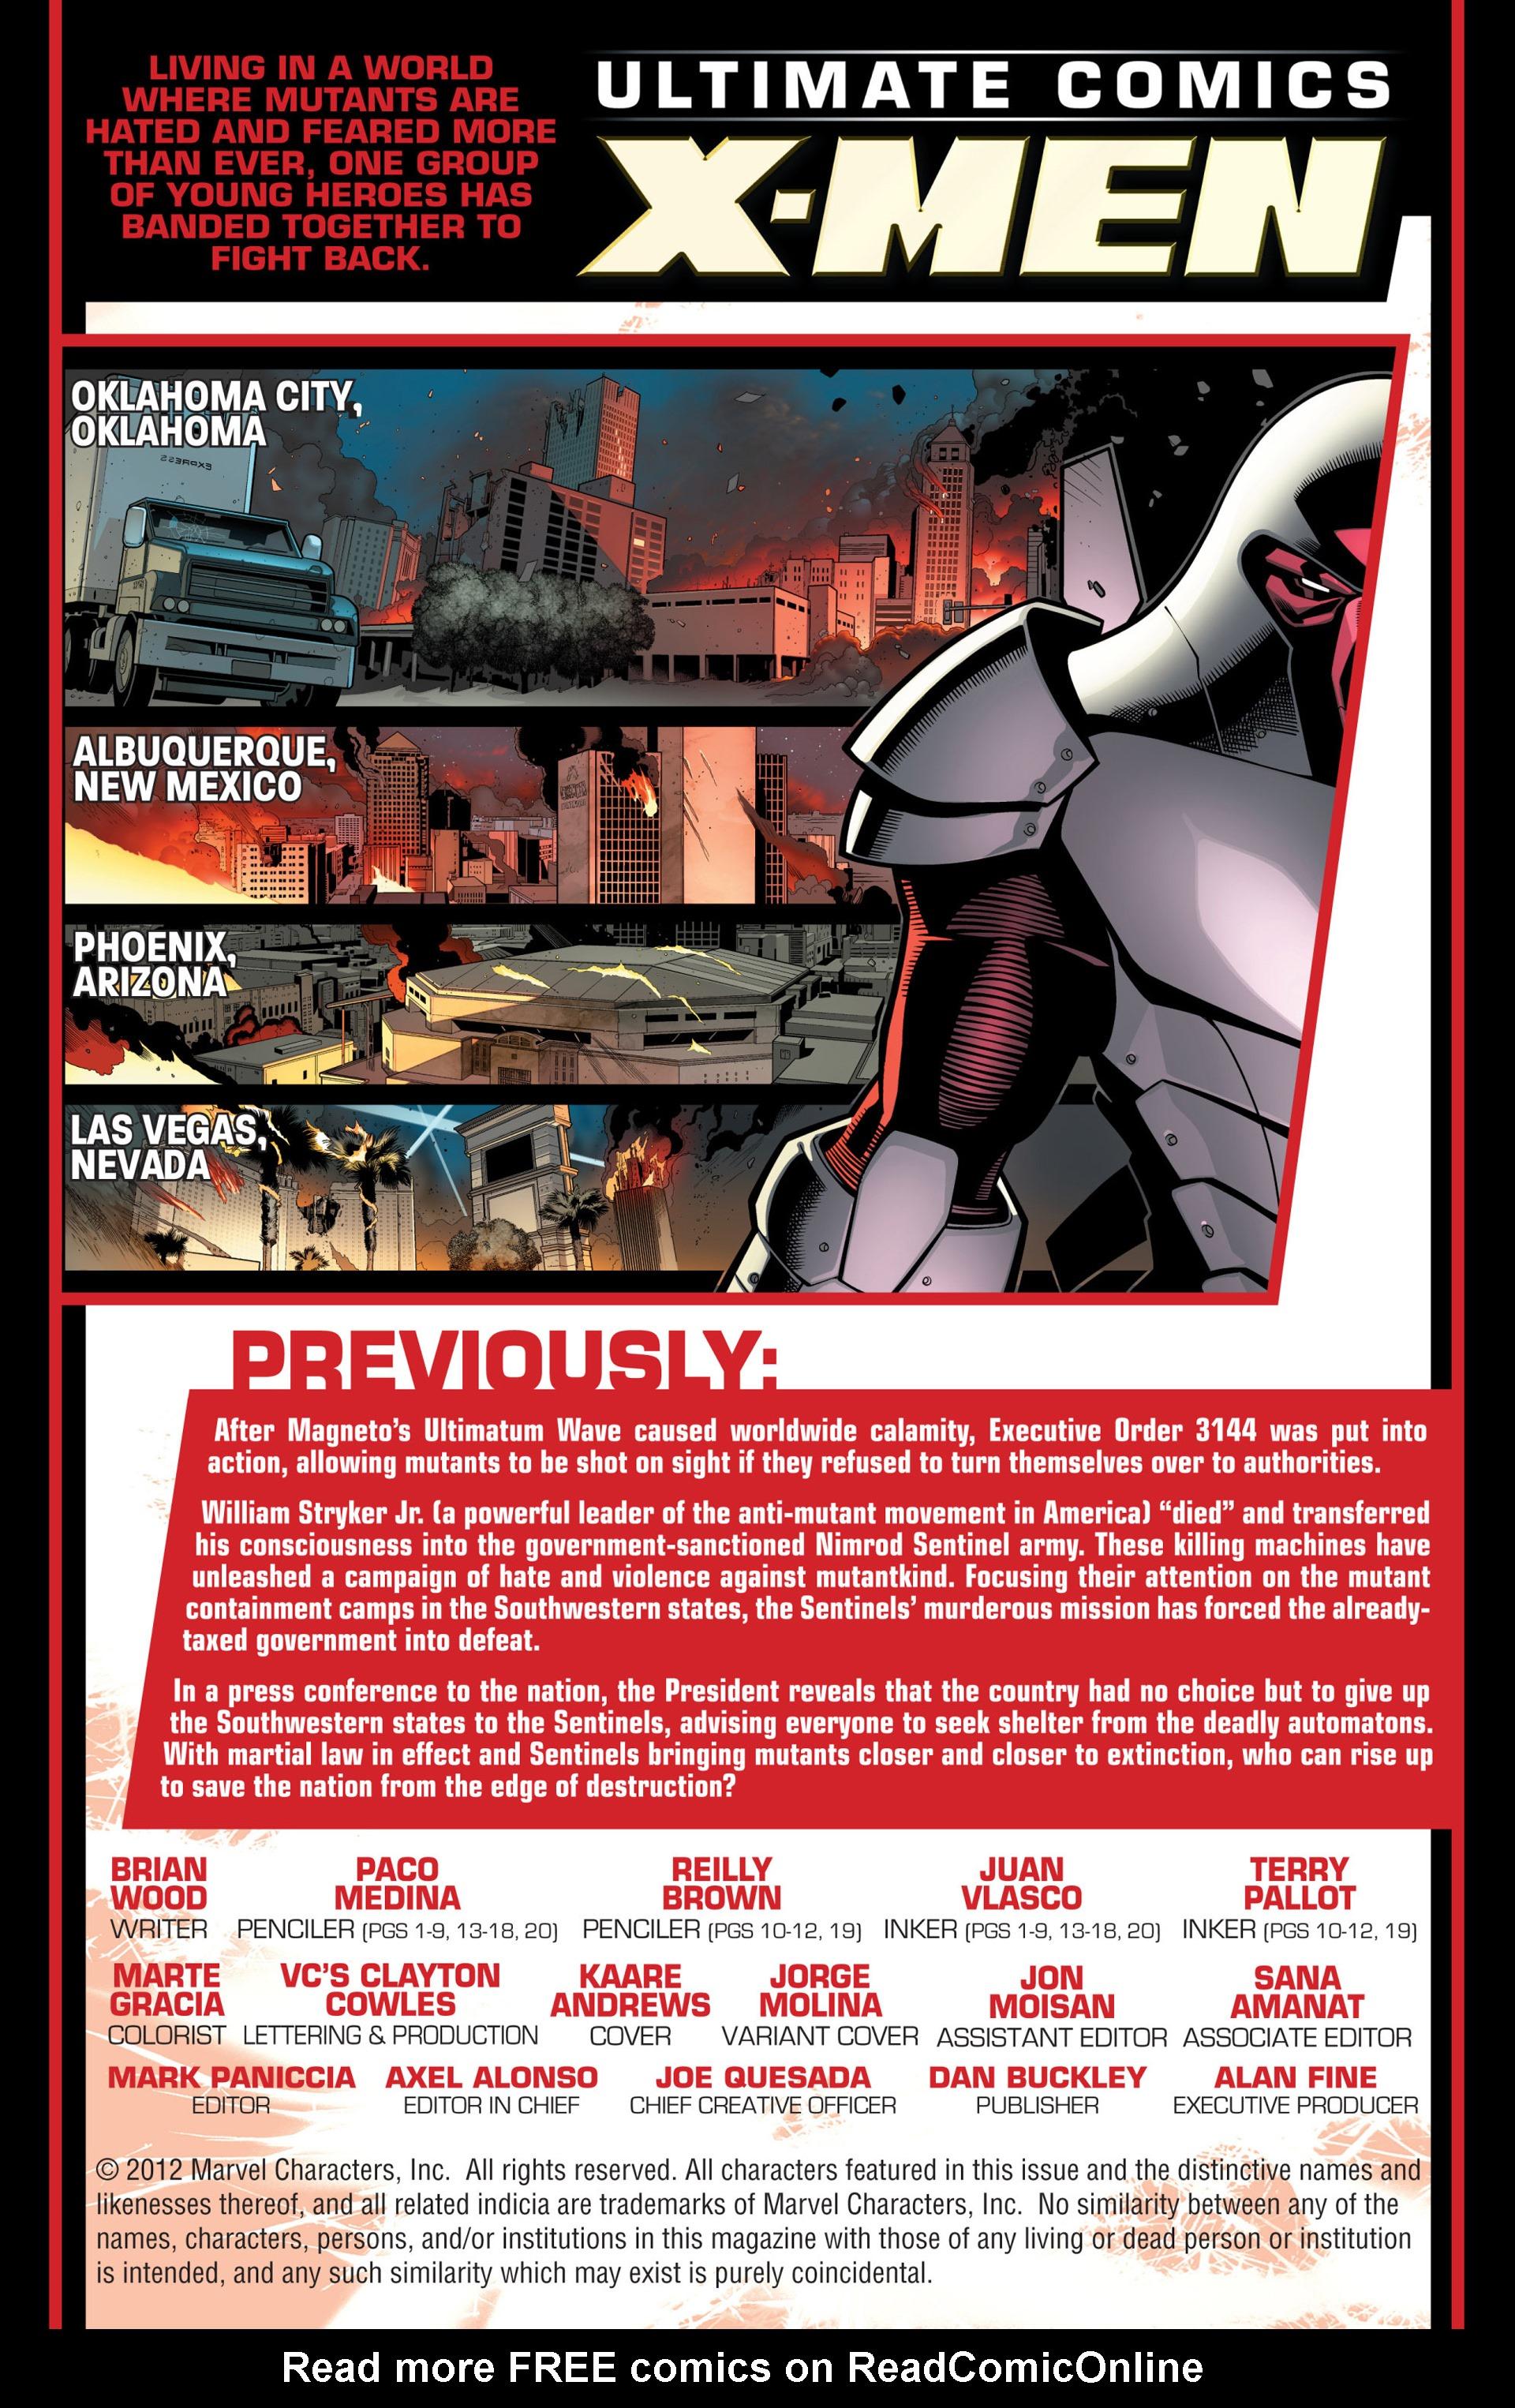 Read online Ultimate Comics X-Men comic -  Issue #13 - 2